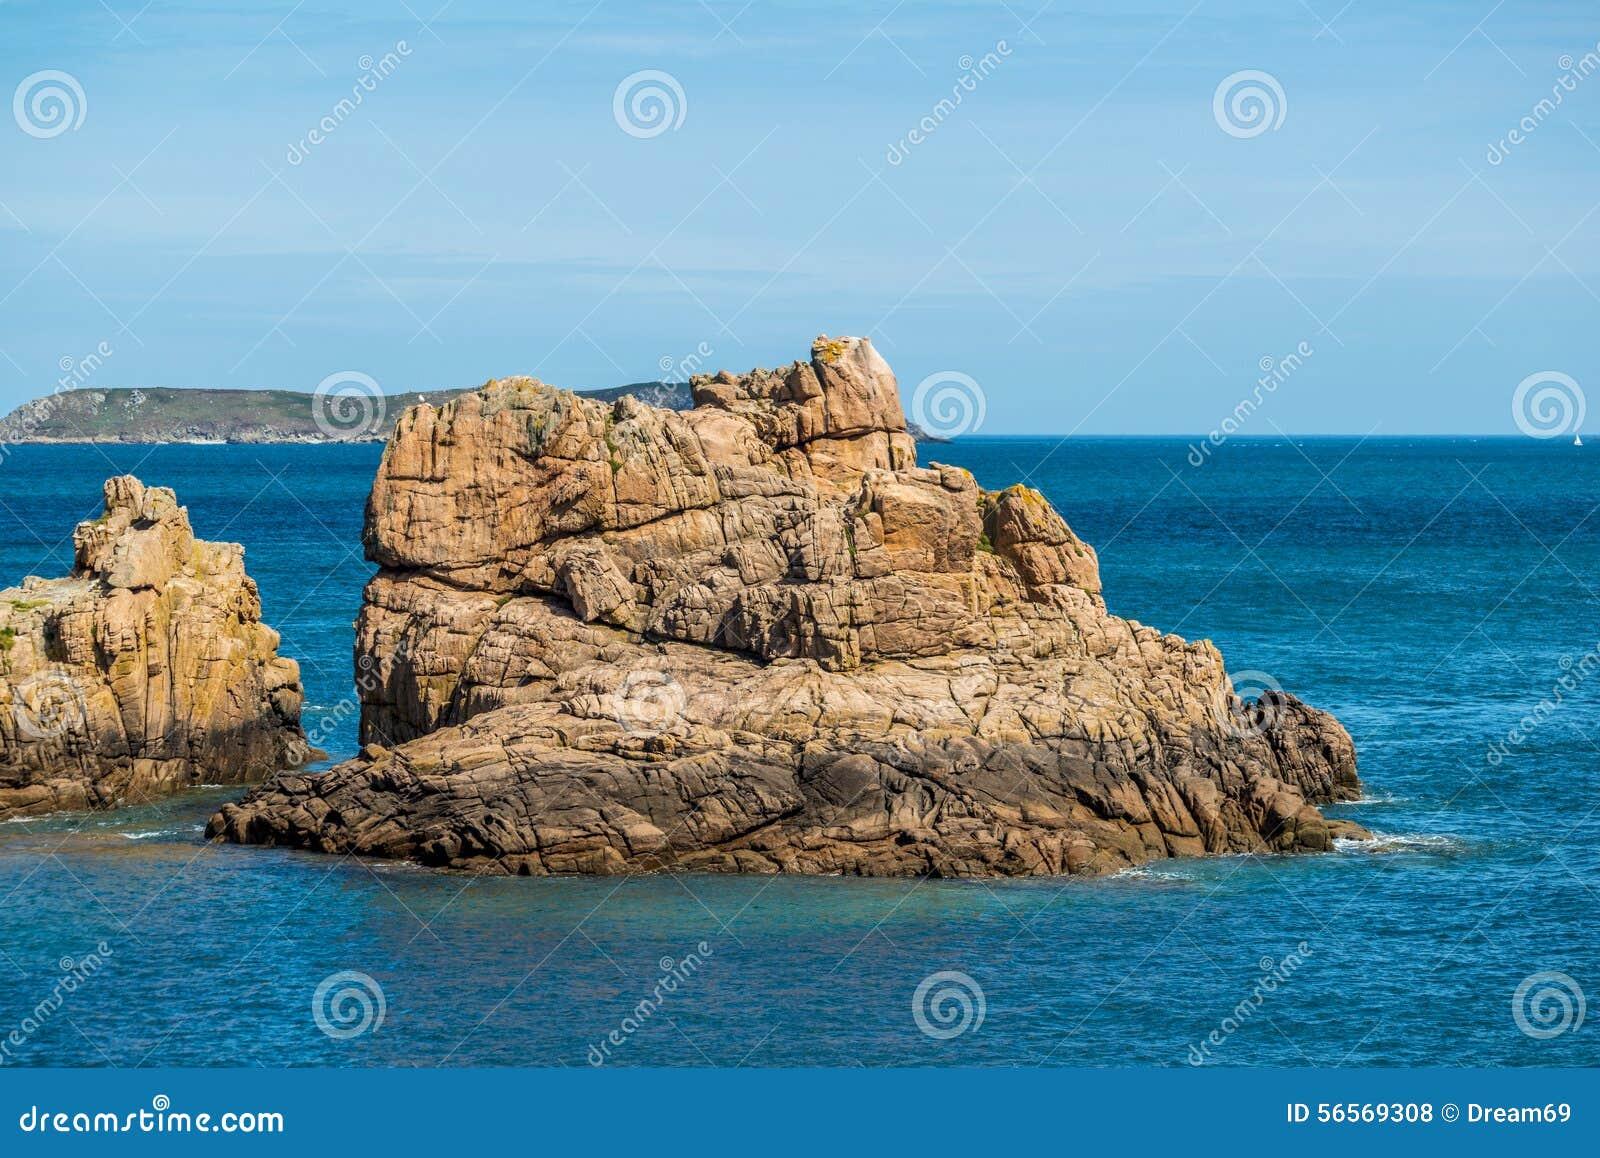 Download Ploumanach στη ρόδινη ακτή γρανίτη, Βρετάνη, Γαλλία Στοκ Εικόνες - εικόνα από ατλαντικό, φύση: 56569308